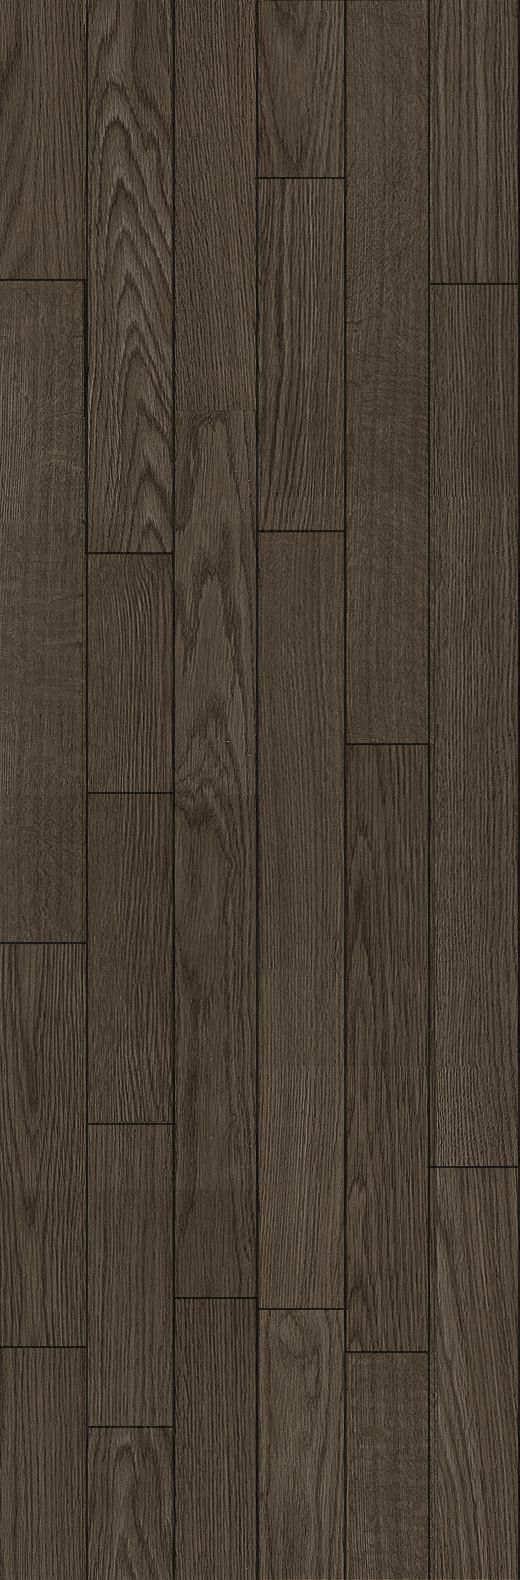 Carpet Wood Flooring Ideas Black Laminate Flooring Ideas And Pics Of Living Room Flooring Pattern Woodfloori Wood Floor Texture Wood Texture Wooden Flooring